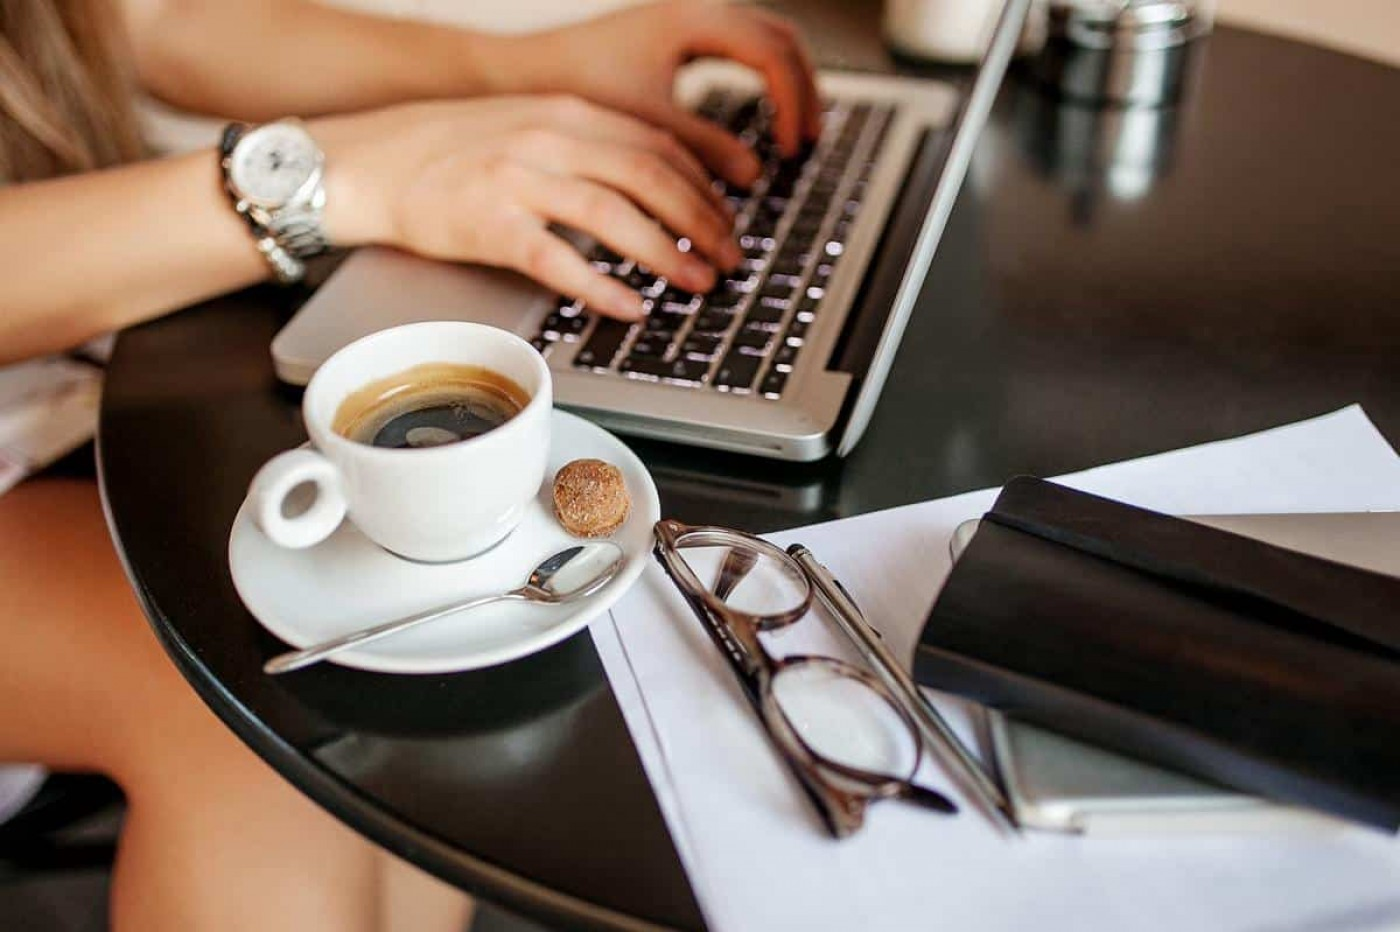 001 Essay Example Imposing Writter Writer Freelance Free Online Job Philippines 1400